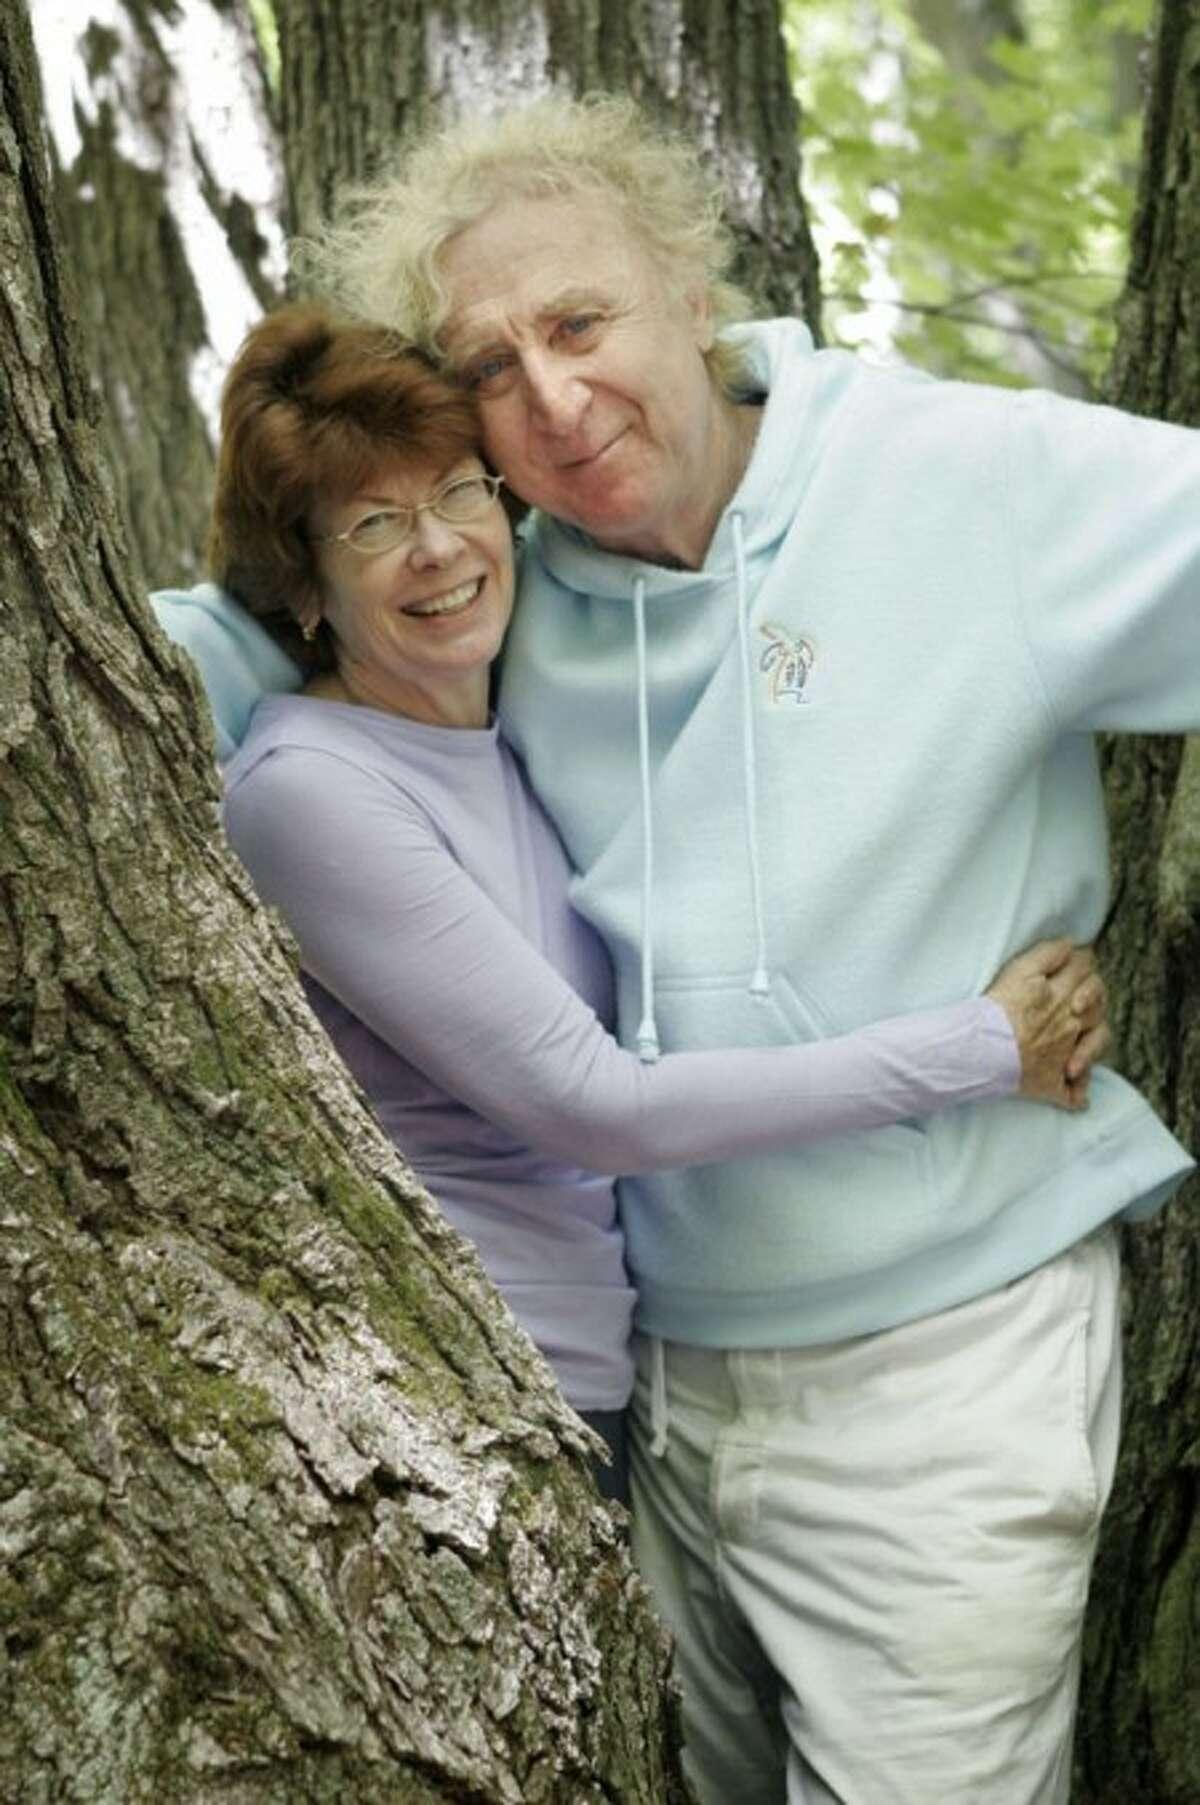 The Bartlett Arboretum & Gardens will honor Karen Wilder and her husband, actor Gene Wilder, for their commitment to the Arboretum at arbor*eating on Saturday, Sept. 26.